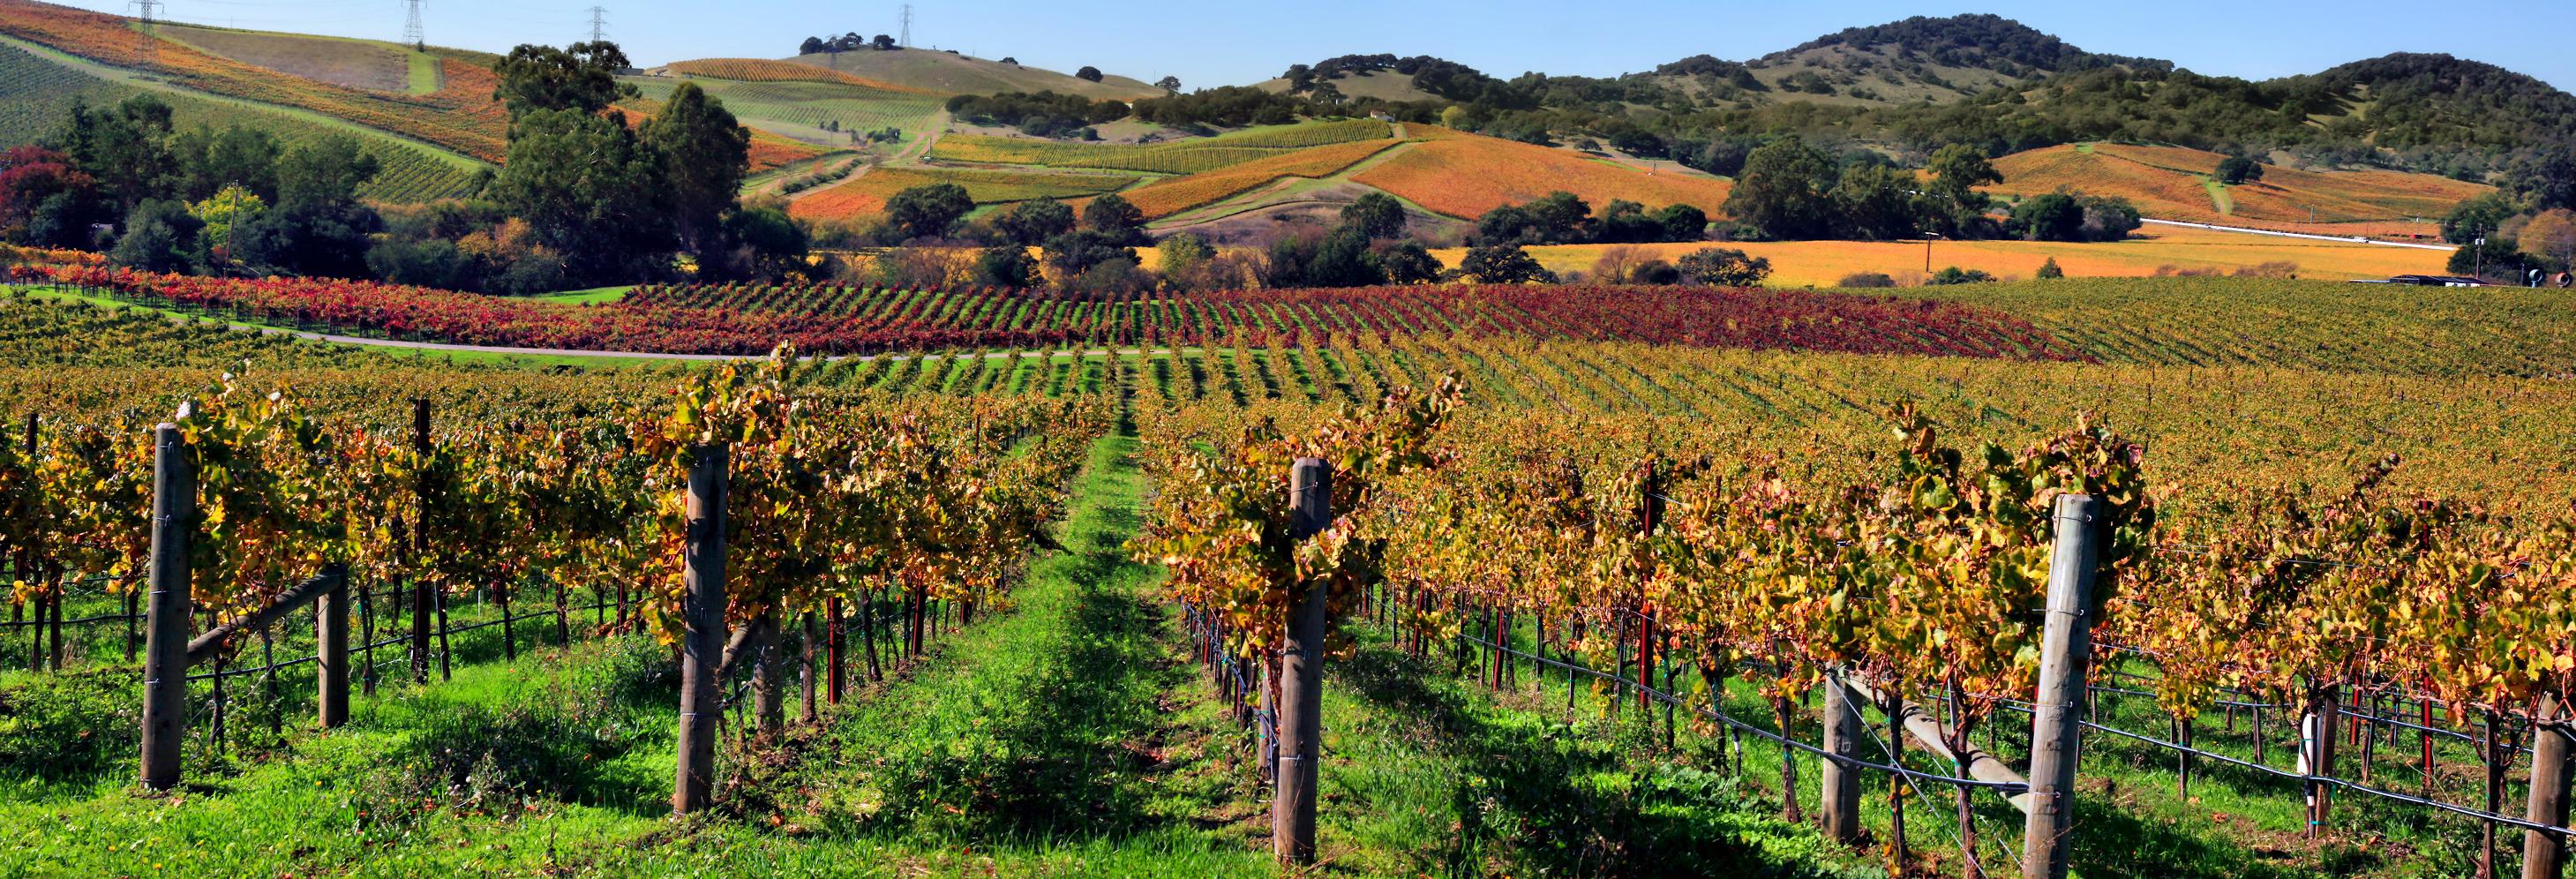 A vineyard in Napa Valley, California. Photo taken by Brocken Inaglory on November 1, 2009.